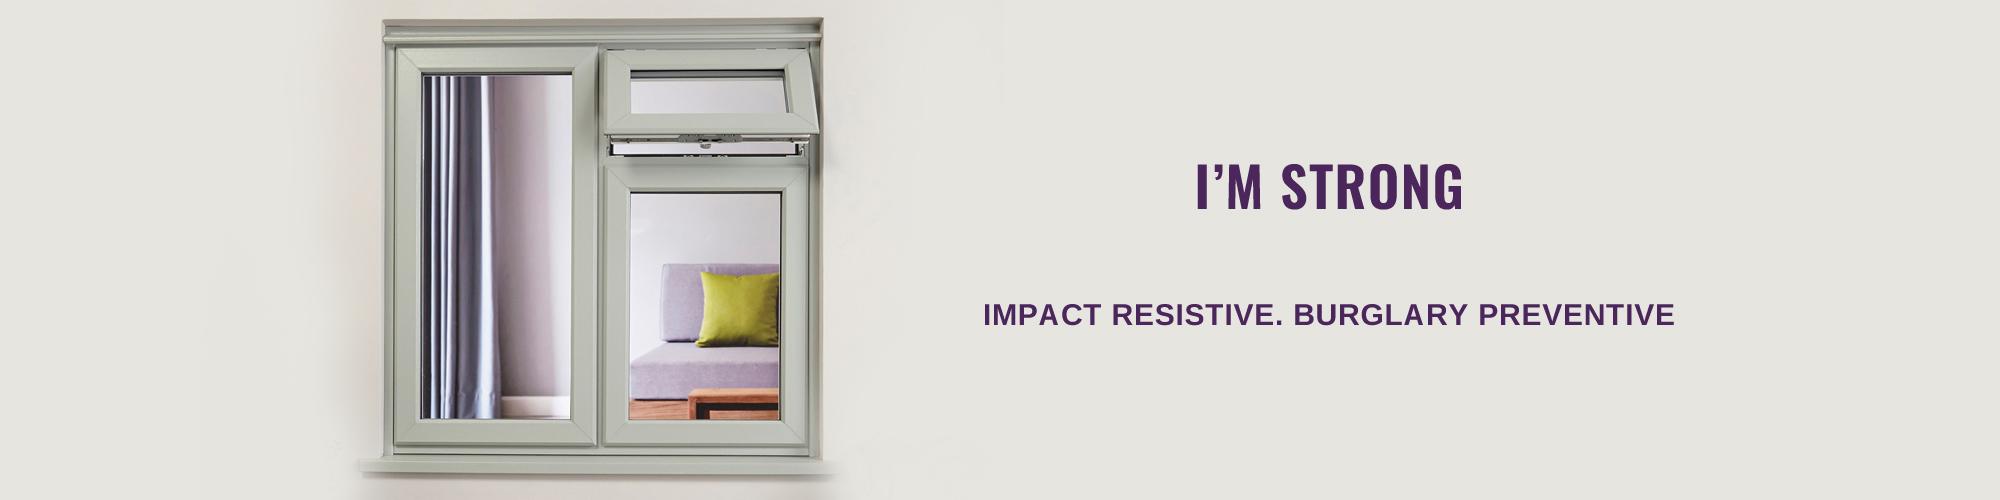 impact-resistance